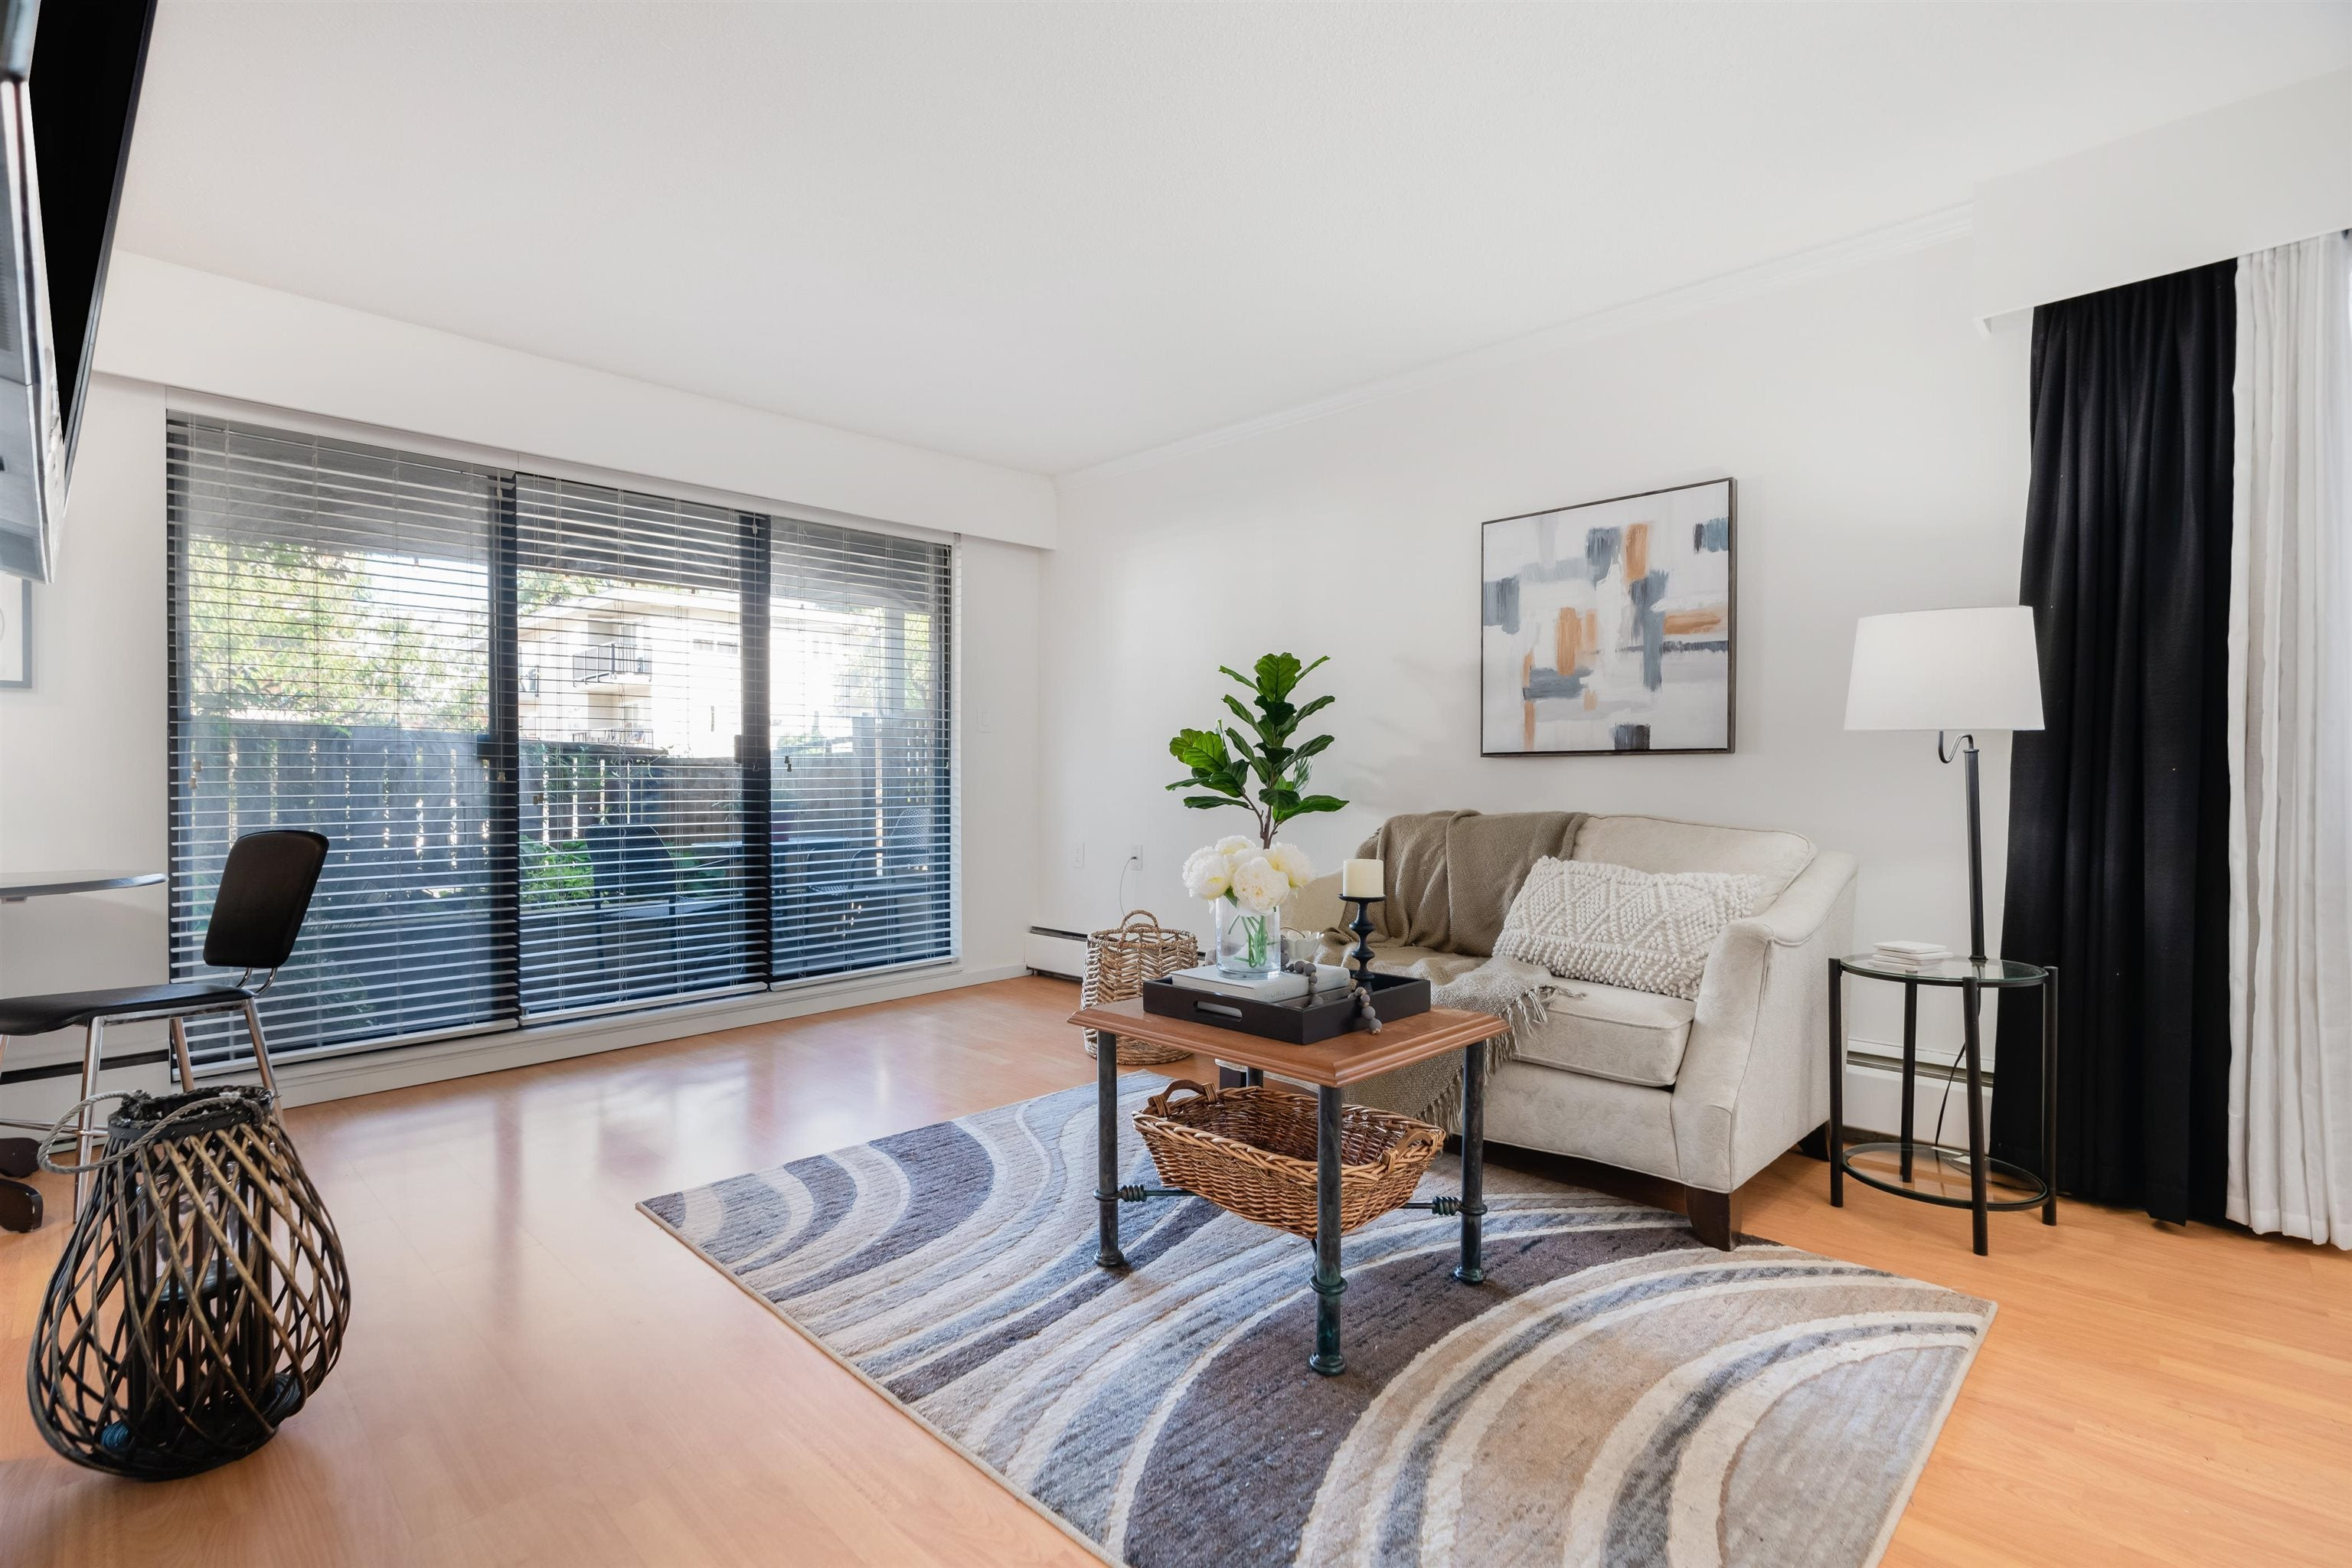 104 2424 CYPRESS STREET - Kitsilano Apartment/Condo for sale, 1 Bedroom (R2623646)